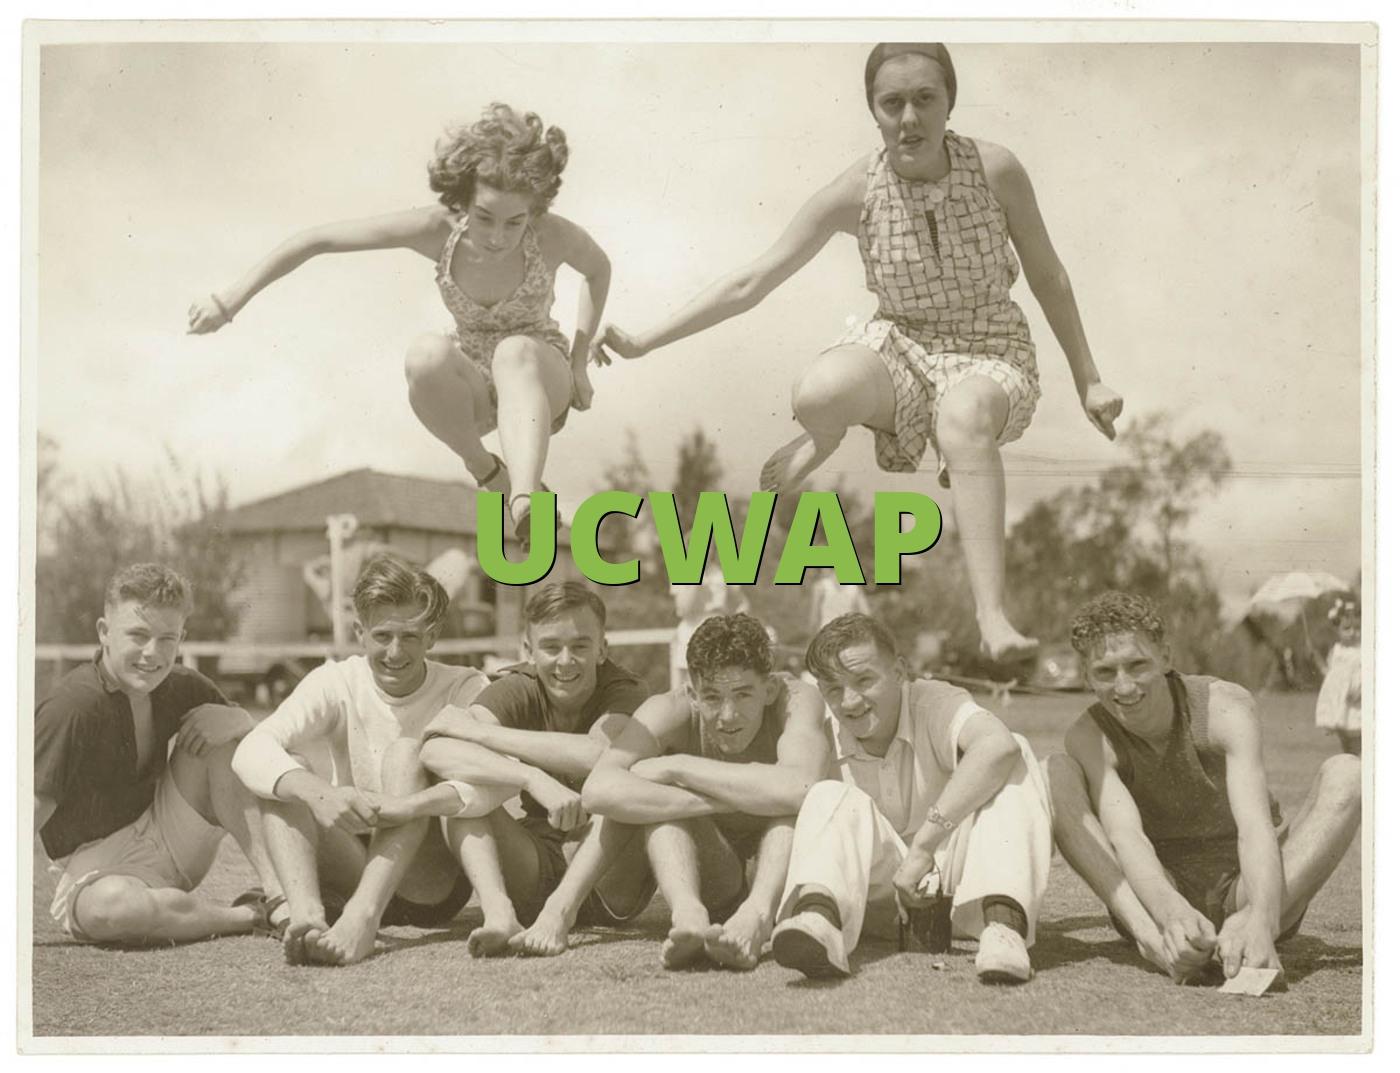 UCWAP